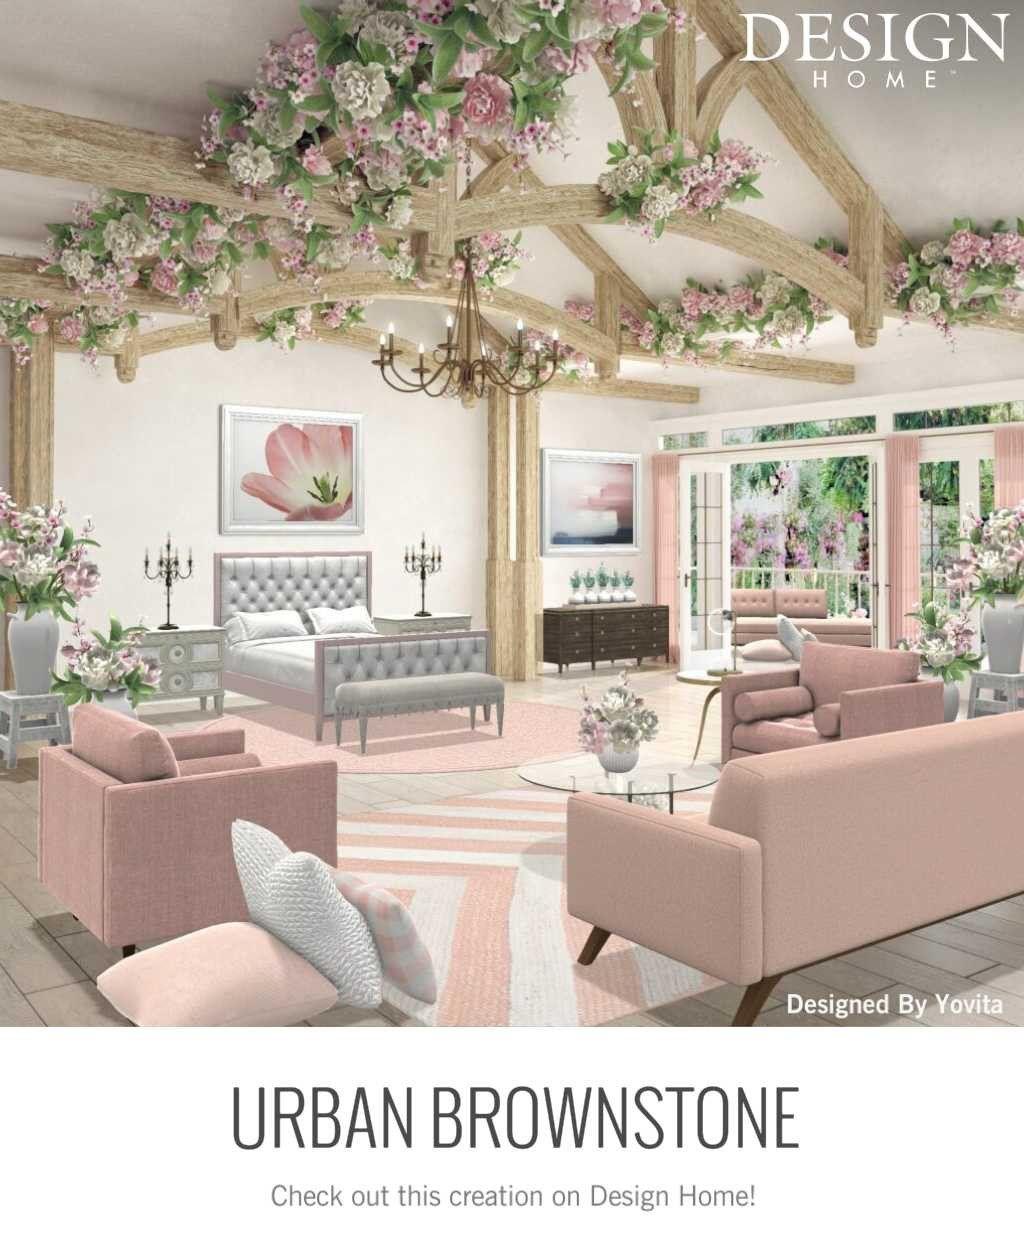 Home Design Online Interior Design And Decorating Tools Design Your Own Bedroom Design Your Bedroom Bedroom Design